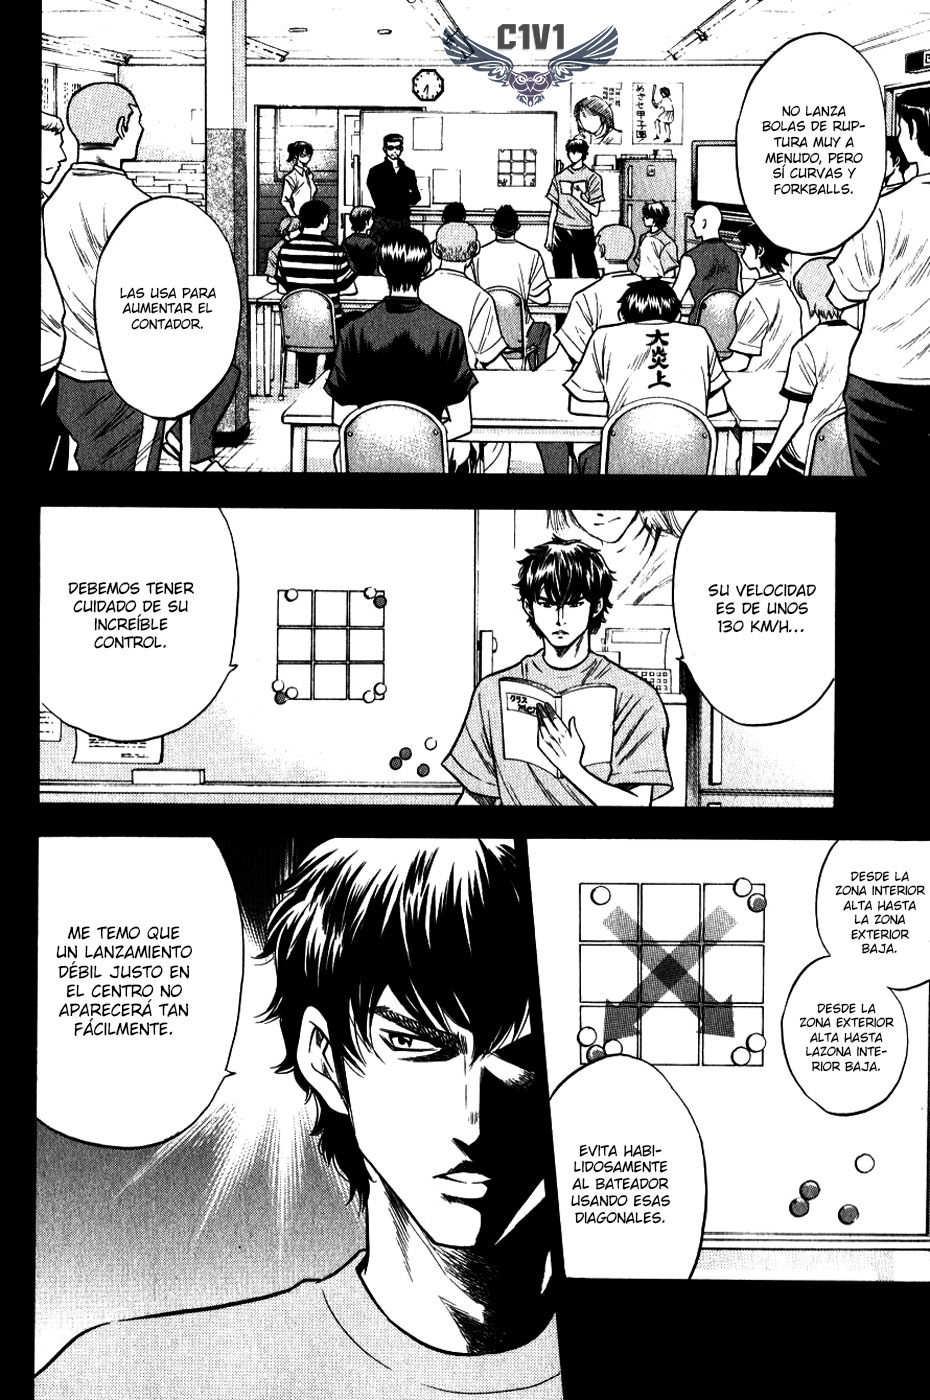 http://c5.ninemanga.com/es_manga/24/1752/391284/5f4f25d269af35abf542f09062624683.jpg Page 7